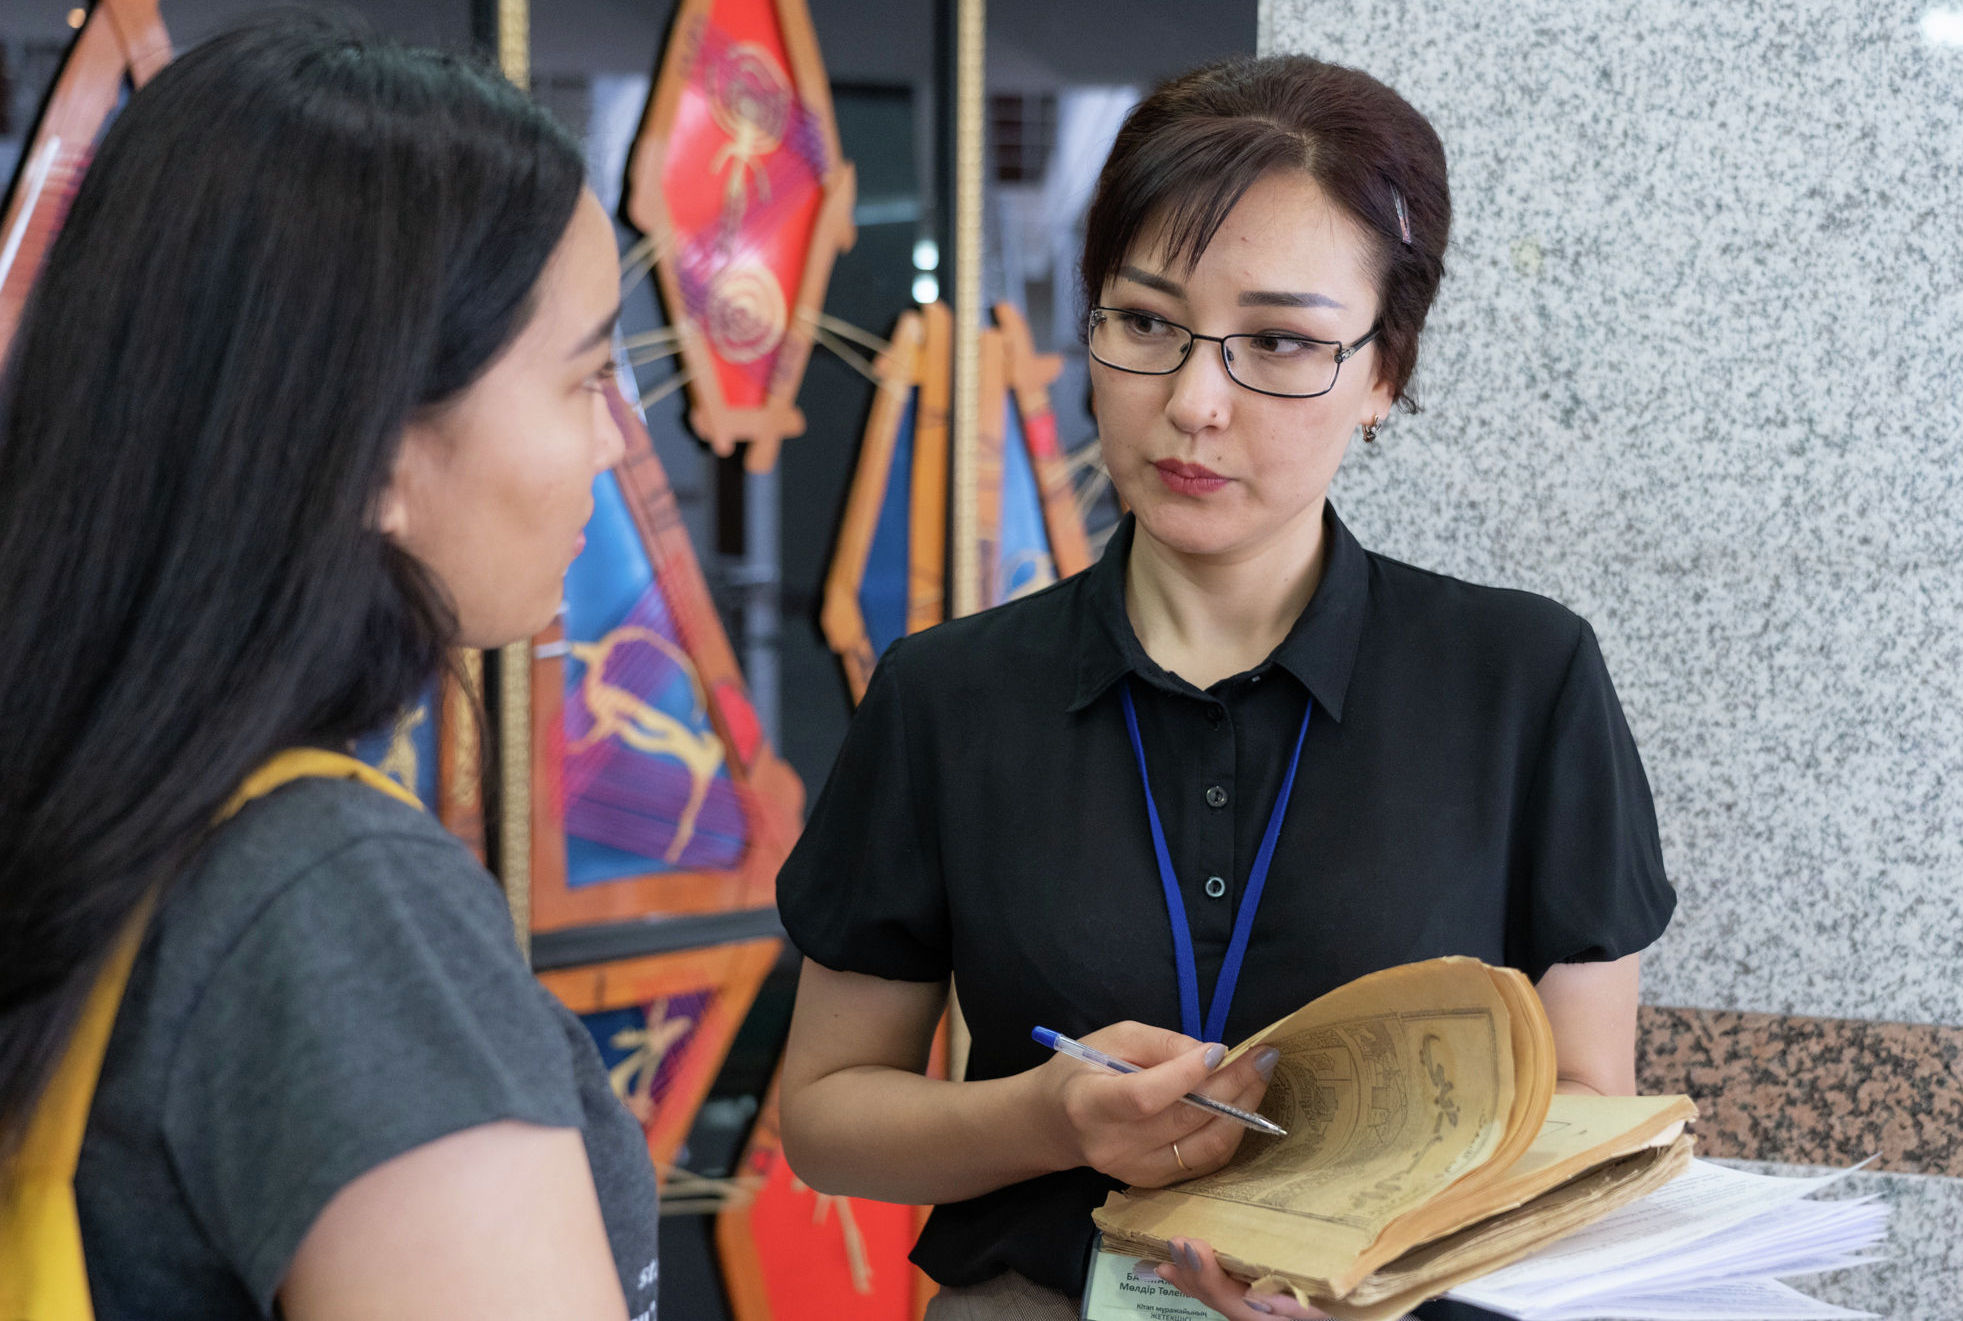 Руководитель музея книг Молдир Баймухамбетова